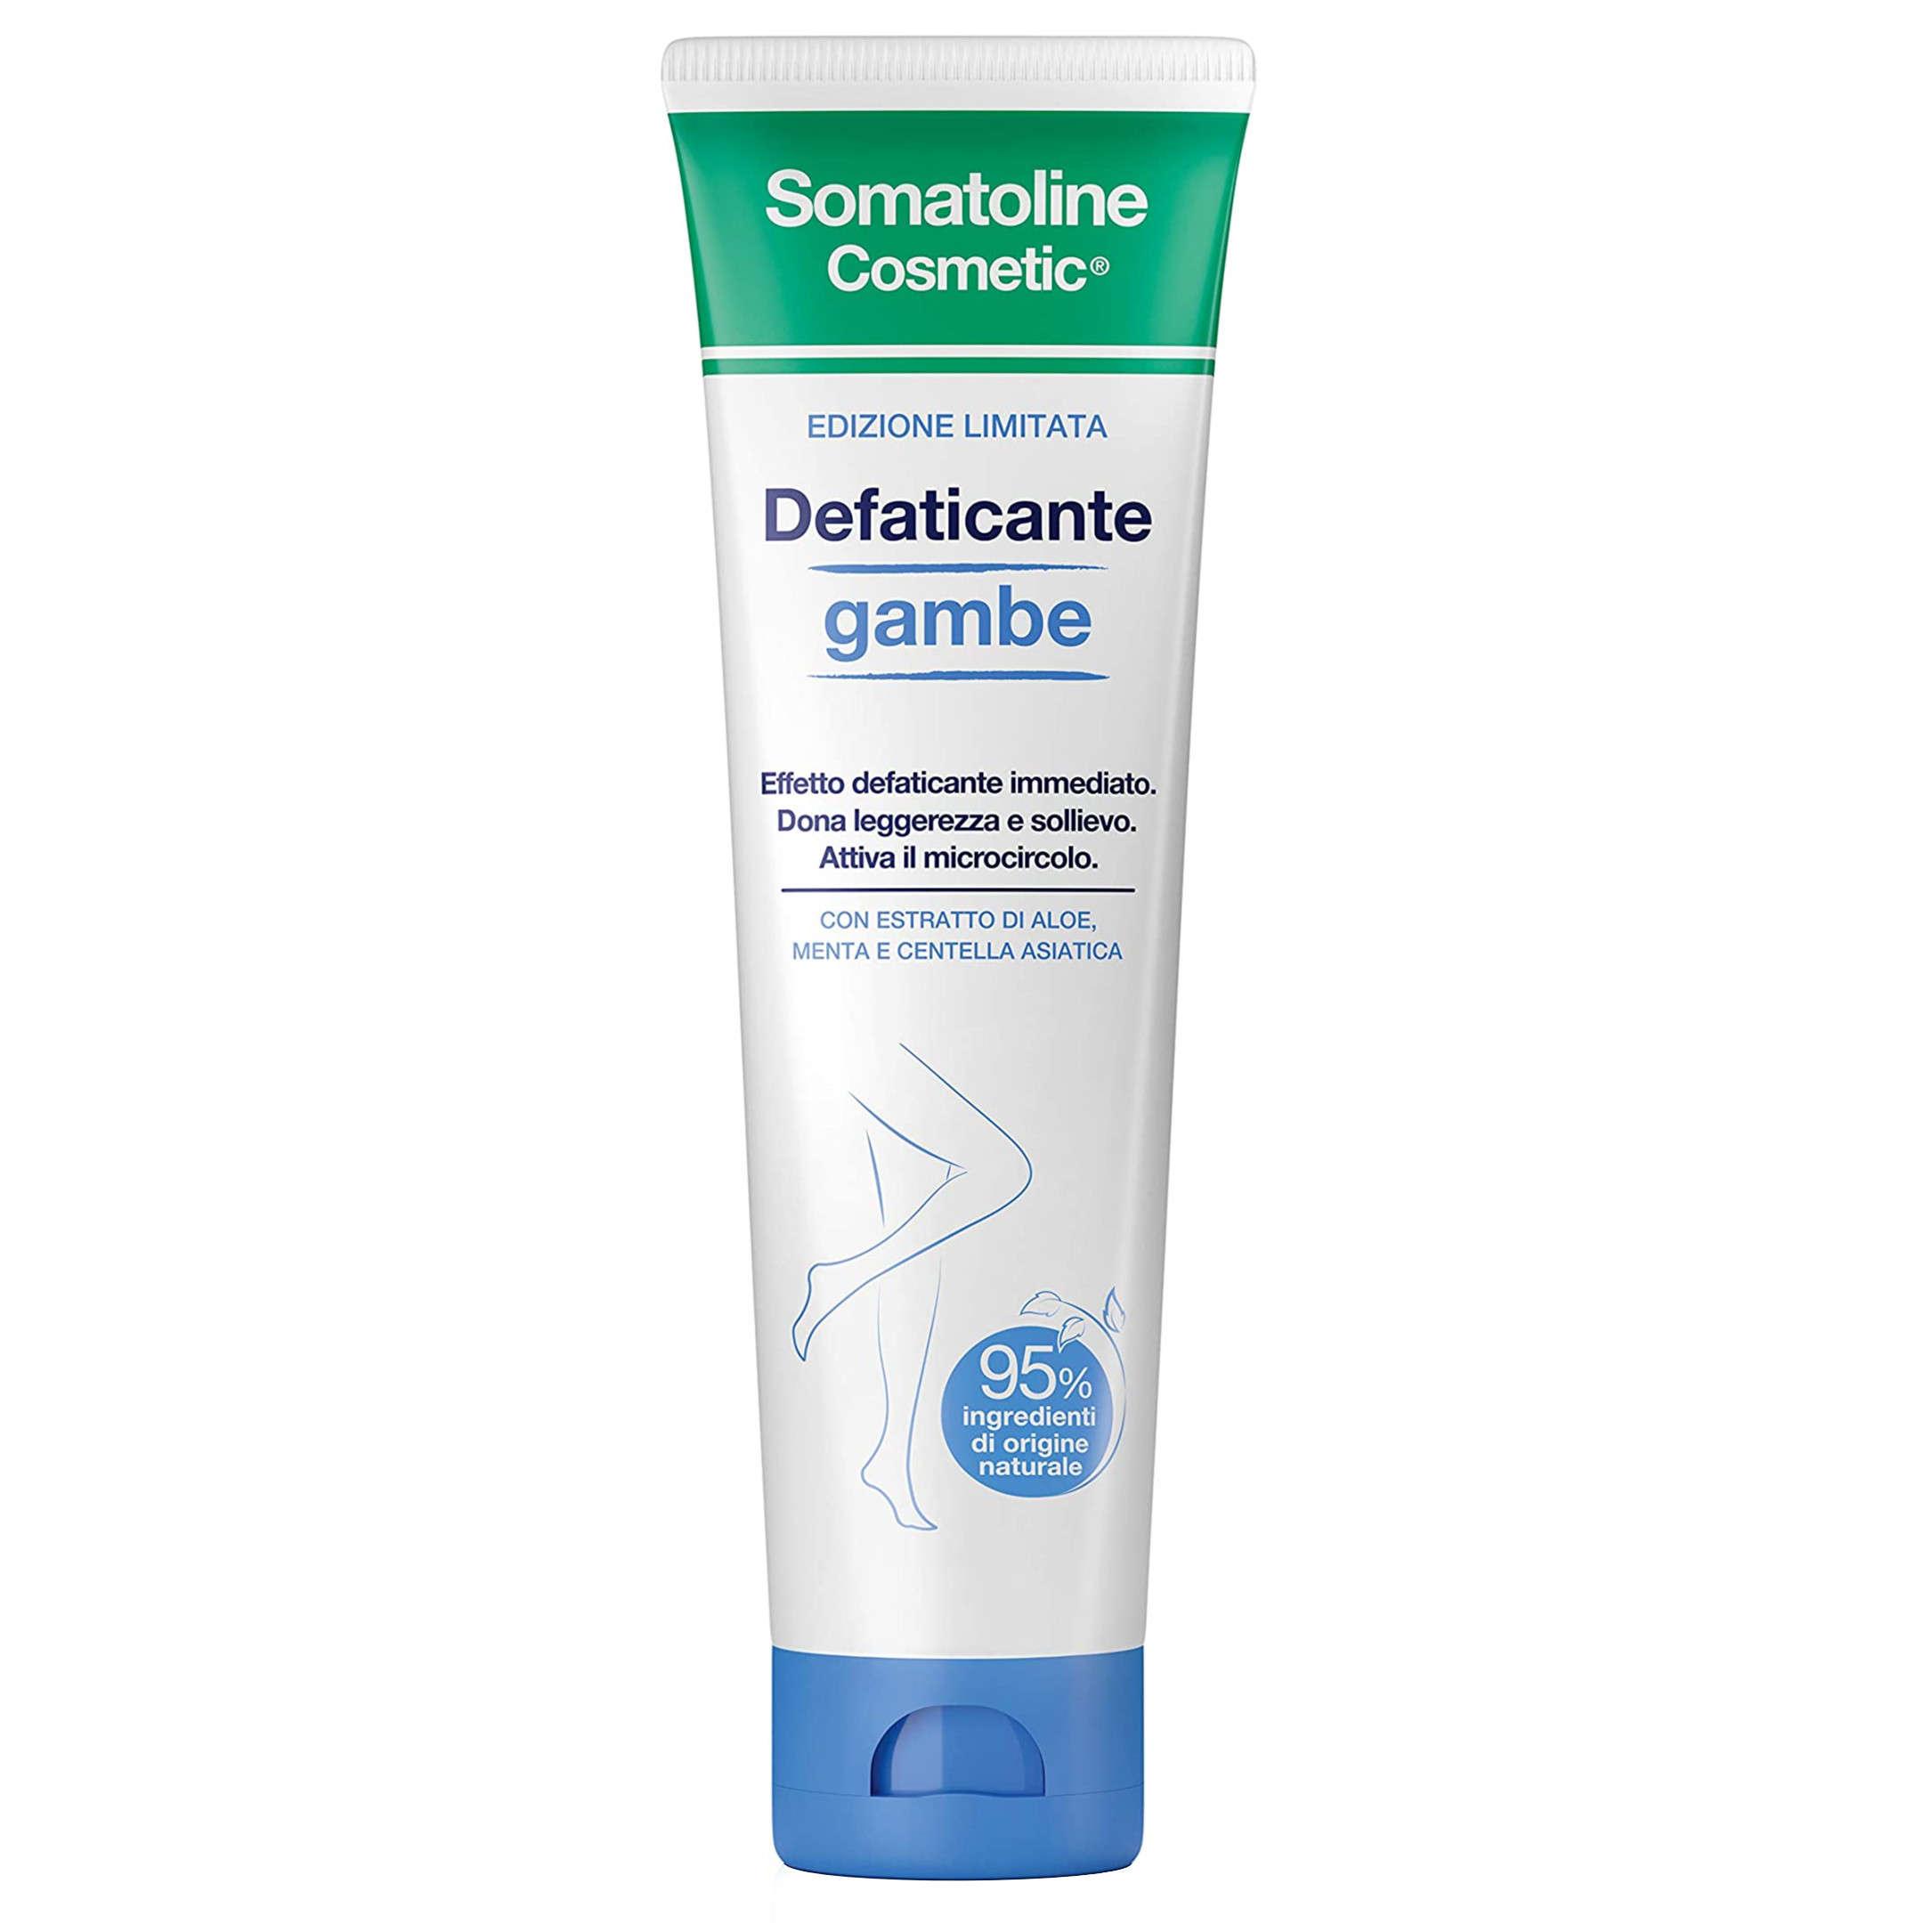 Somatoline - Cosmetic - Defaticante Gambe